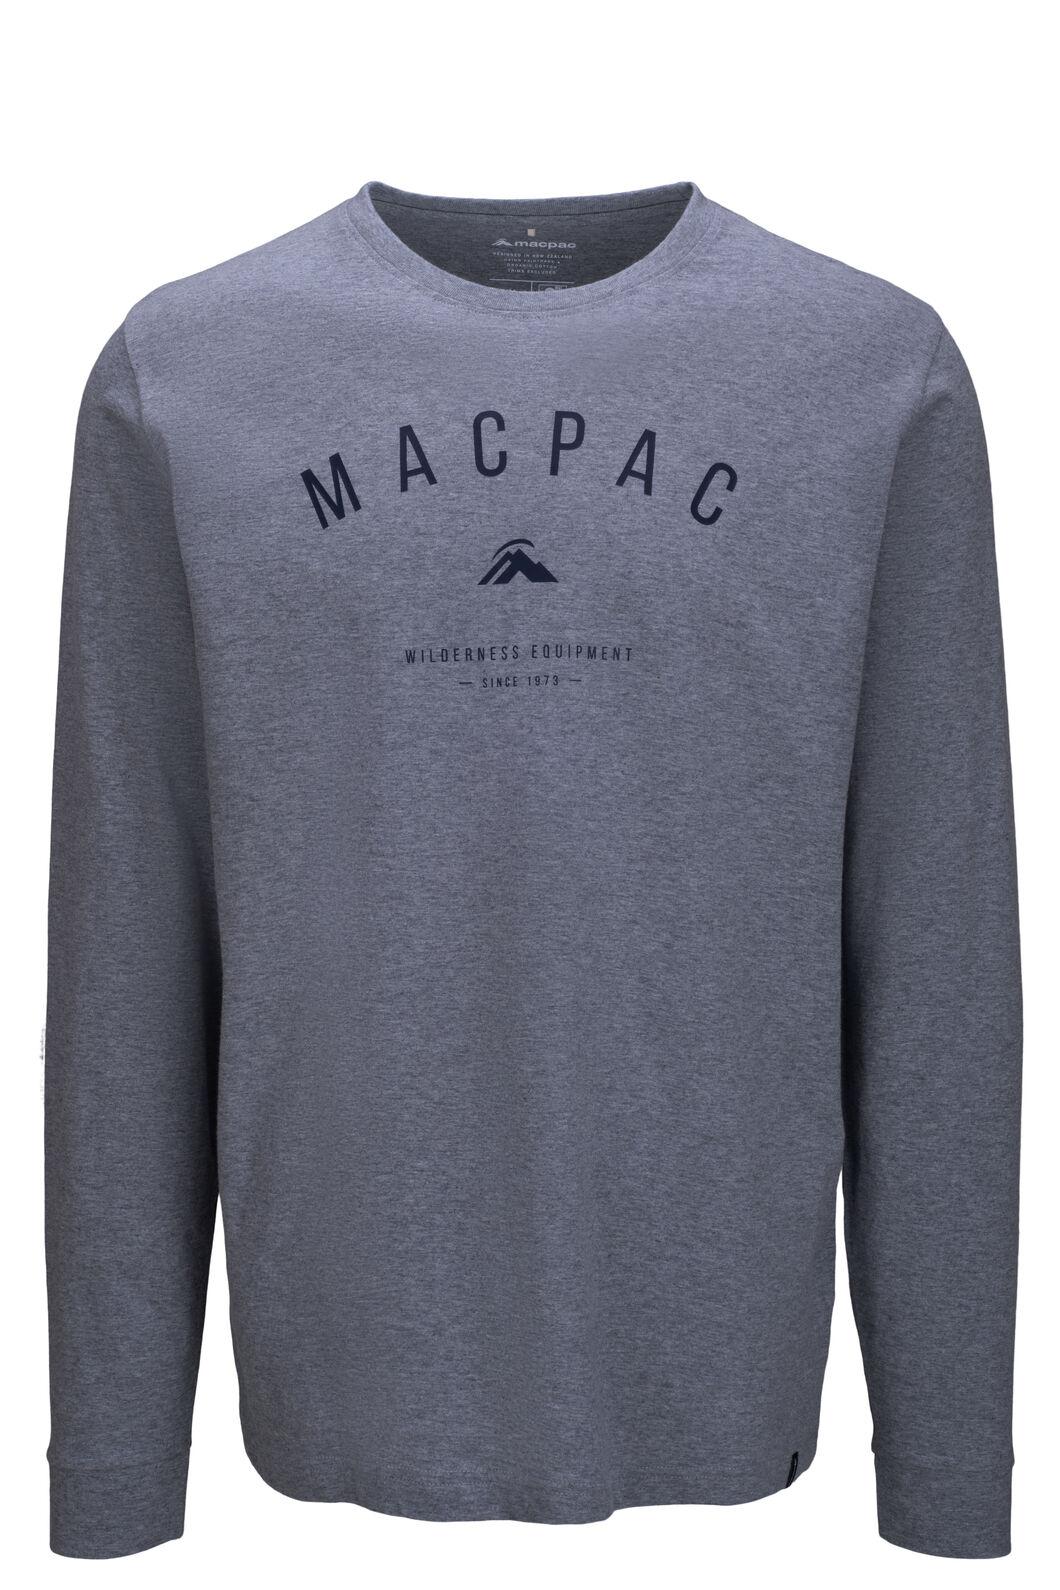 Macpac Men's Graphic Long Sleeve Tee, Grey Marle, hi-res